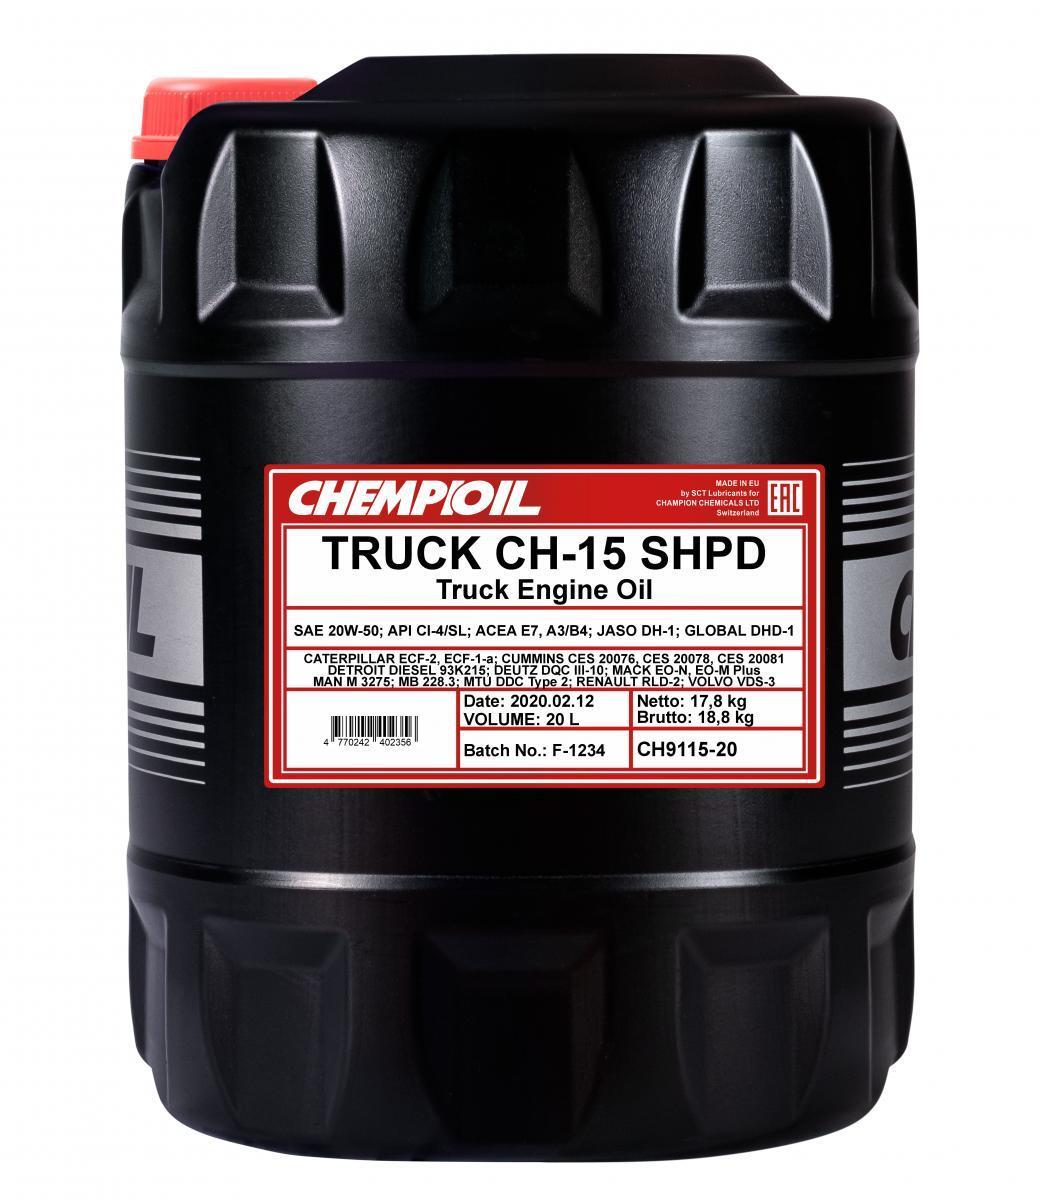 CH9115-20 CHEMPIOIL TRUCK, CH-15 SHPD 20W-50, 20l Motoröl CH9115-20 günstig kaufen